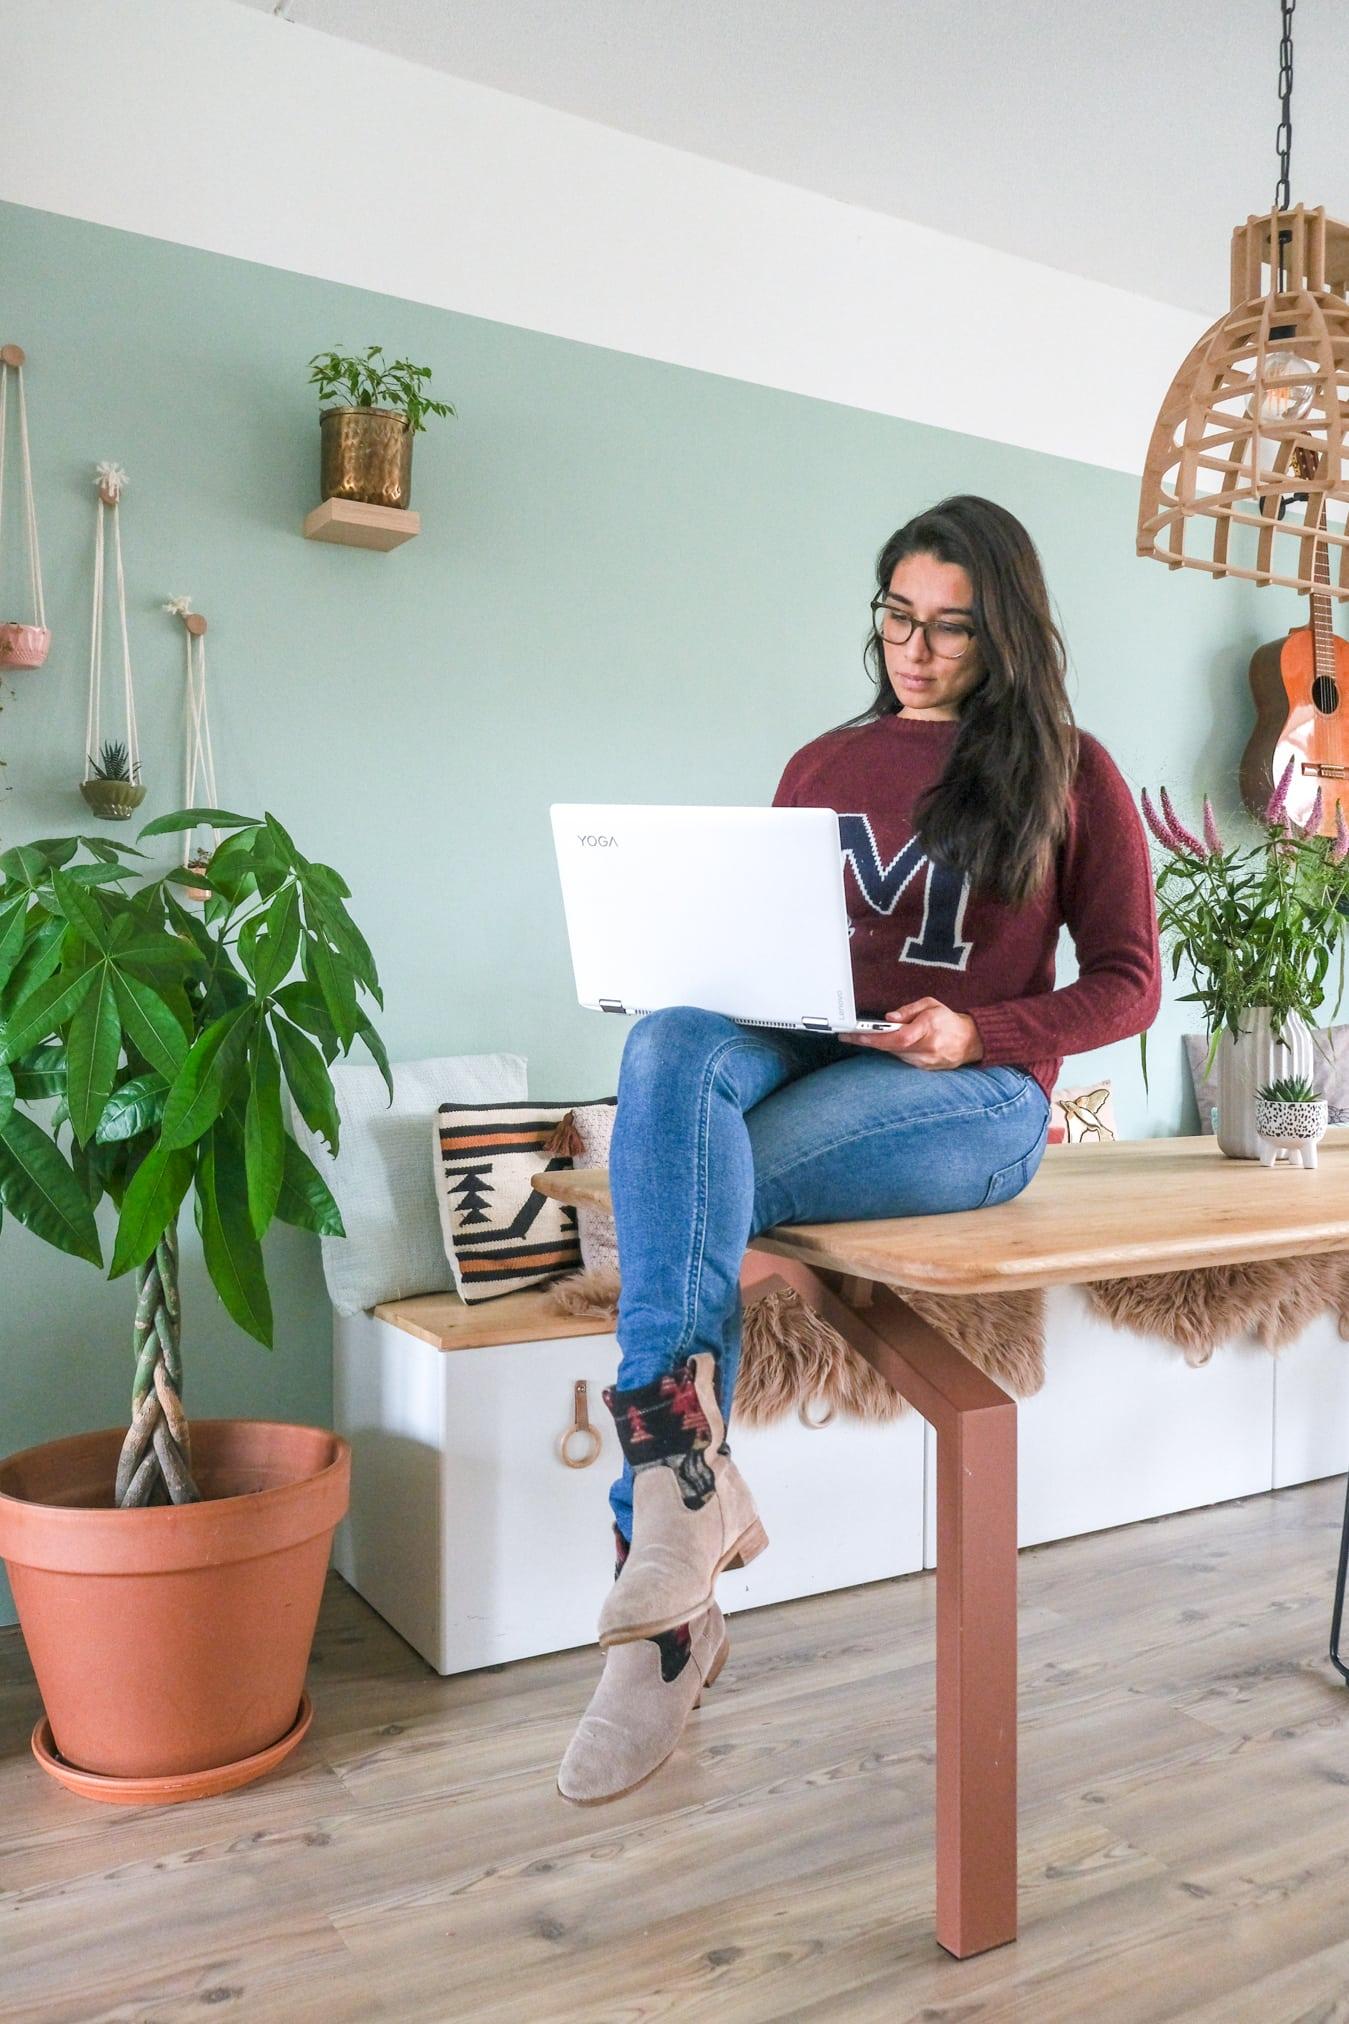 duurzame blogger verslag